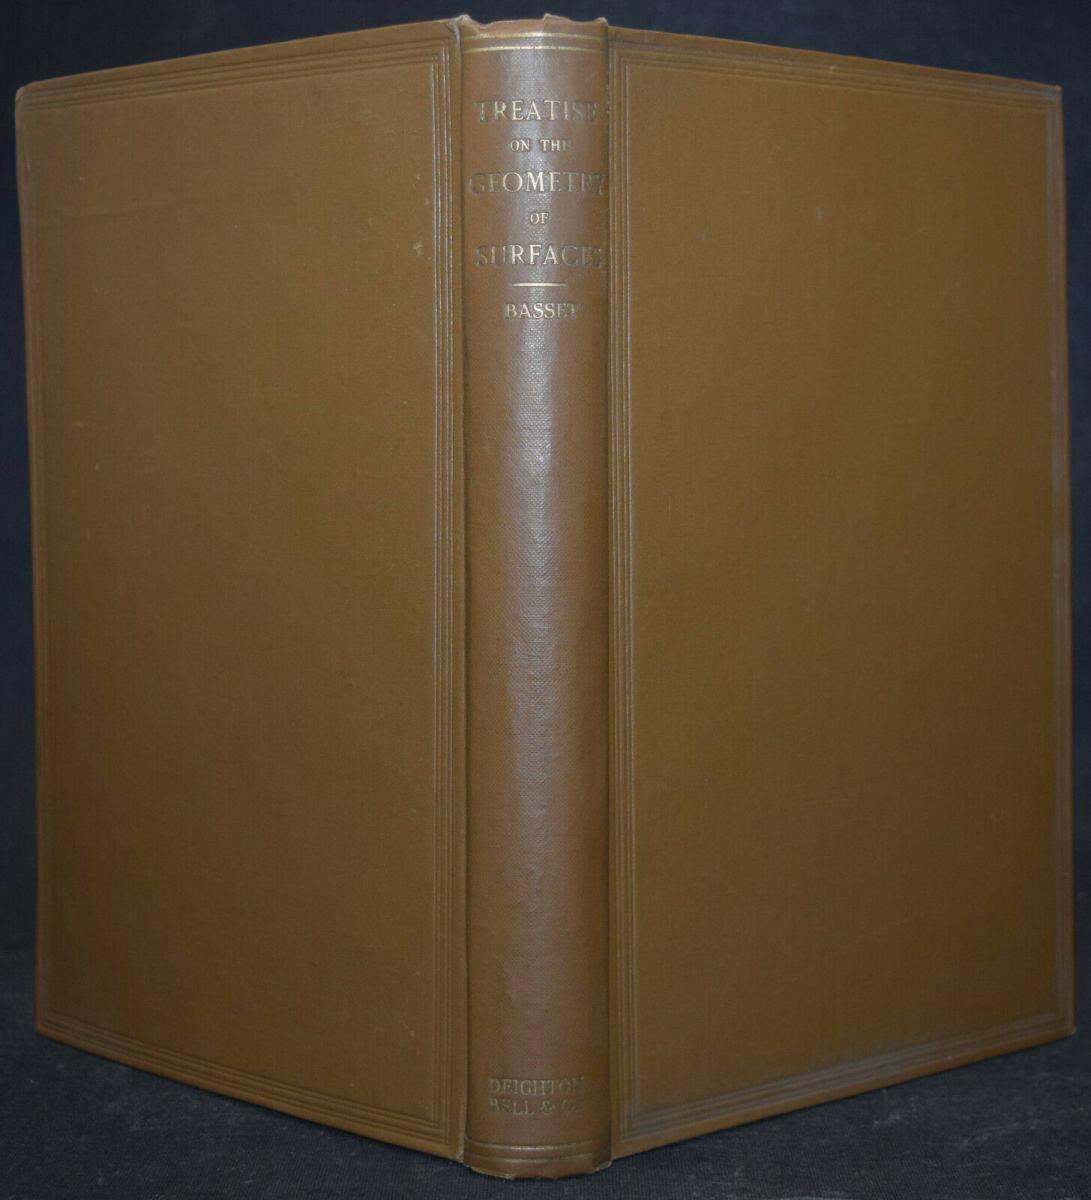 A TREATISE ON THE GEOMETRY OF SURFACES - BASSET - ERSTAUSGABE 1910 - GEOMETRIE 1